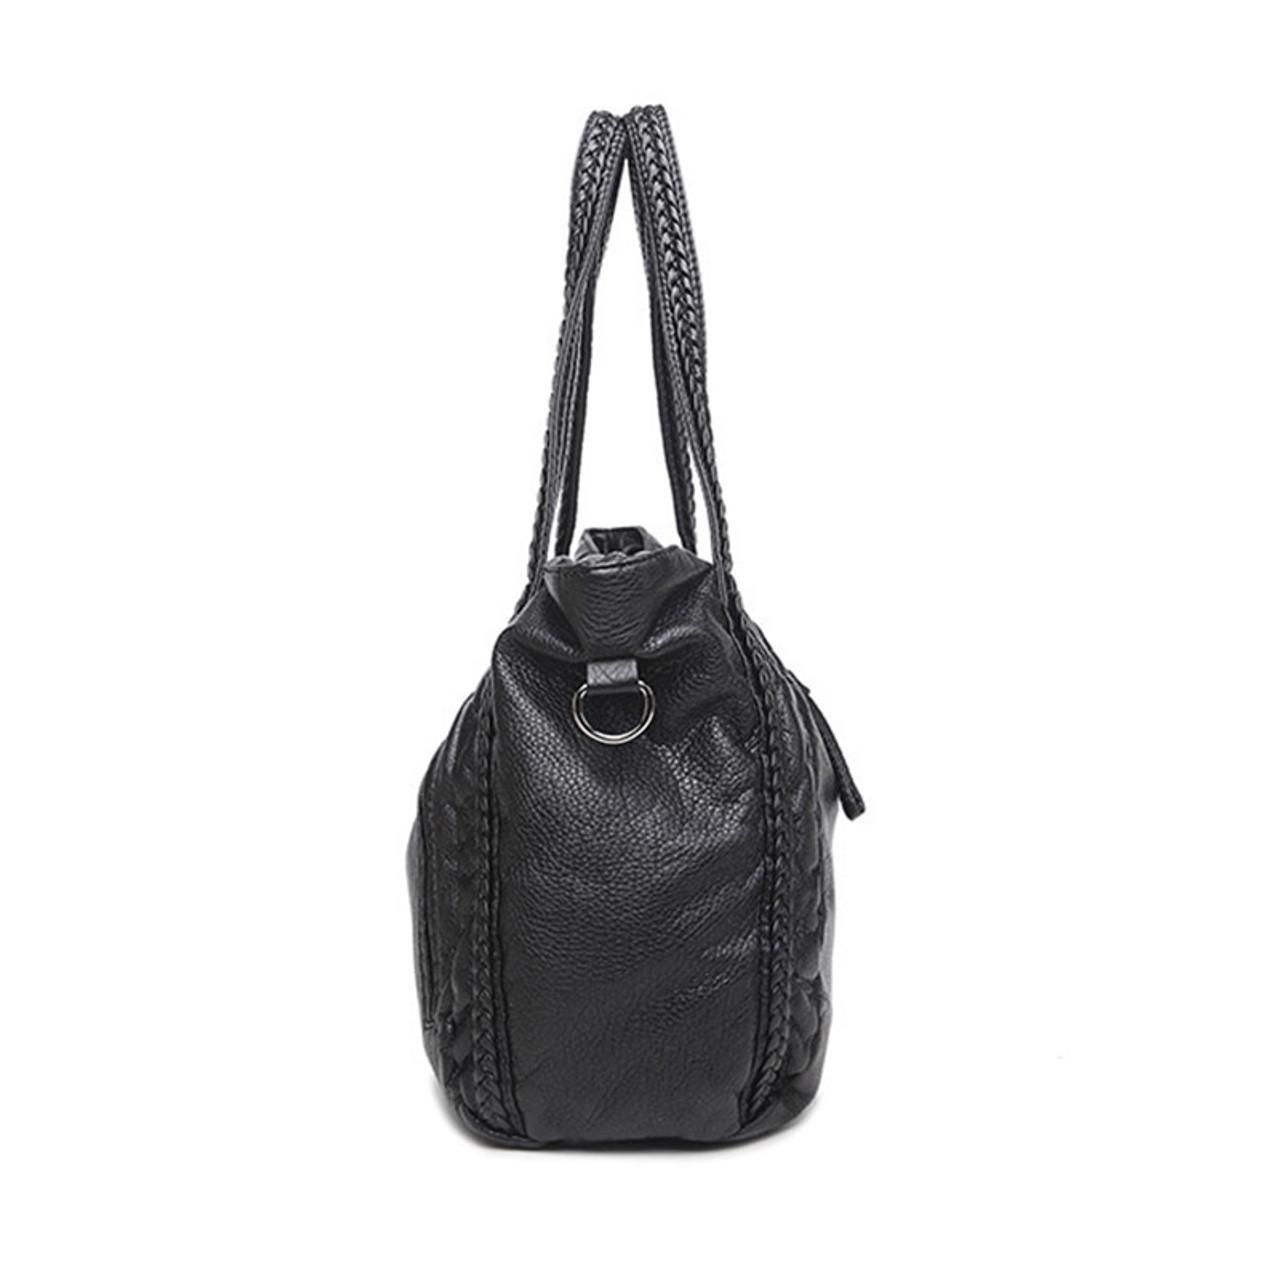 bbbb0b2c80c4 Large Soft Leather Bag for Women Handbags Ladies Crossbody Bags Hobos  Shoulder Bags Female Big Tote Sac A Main